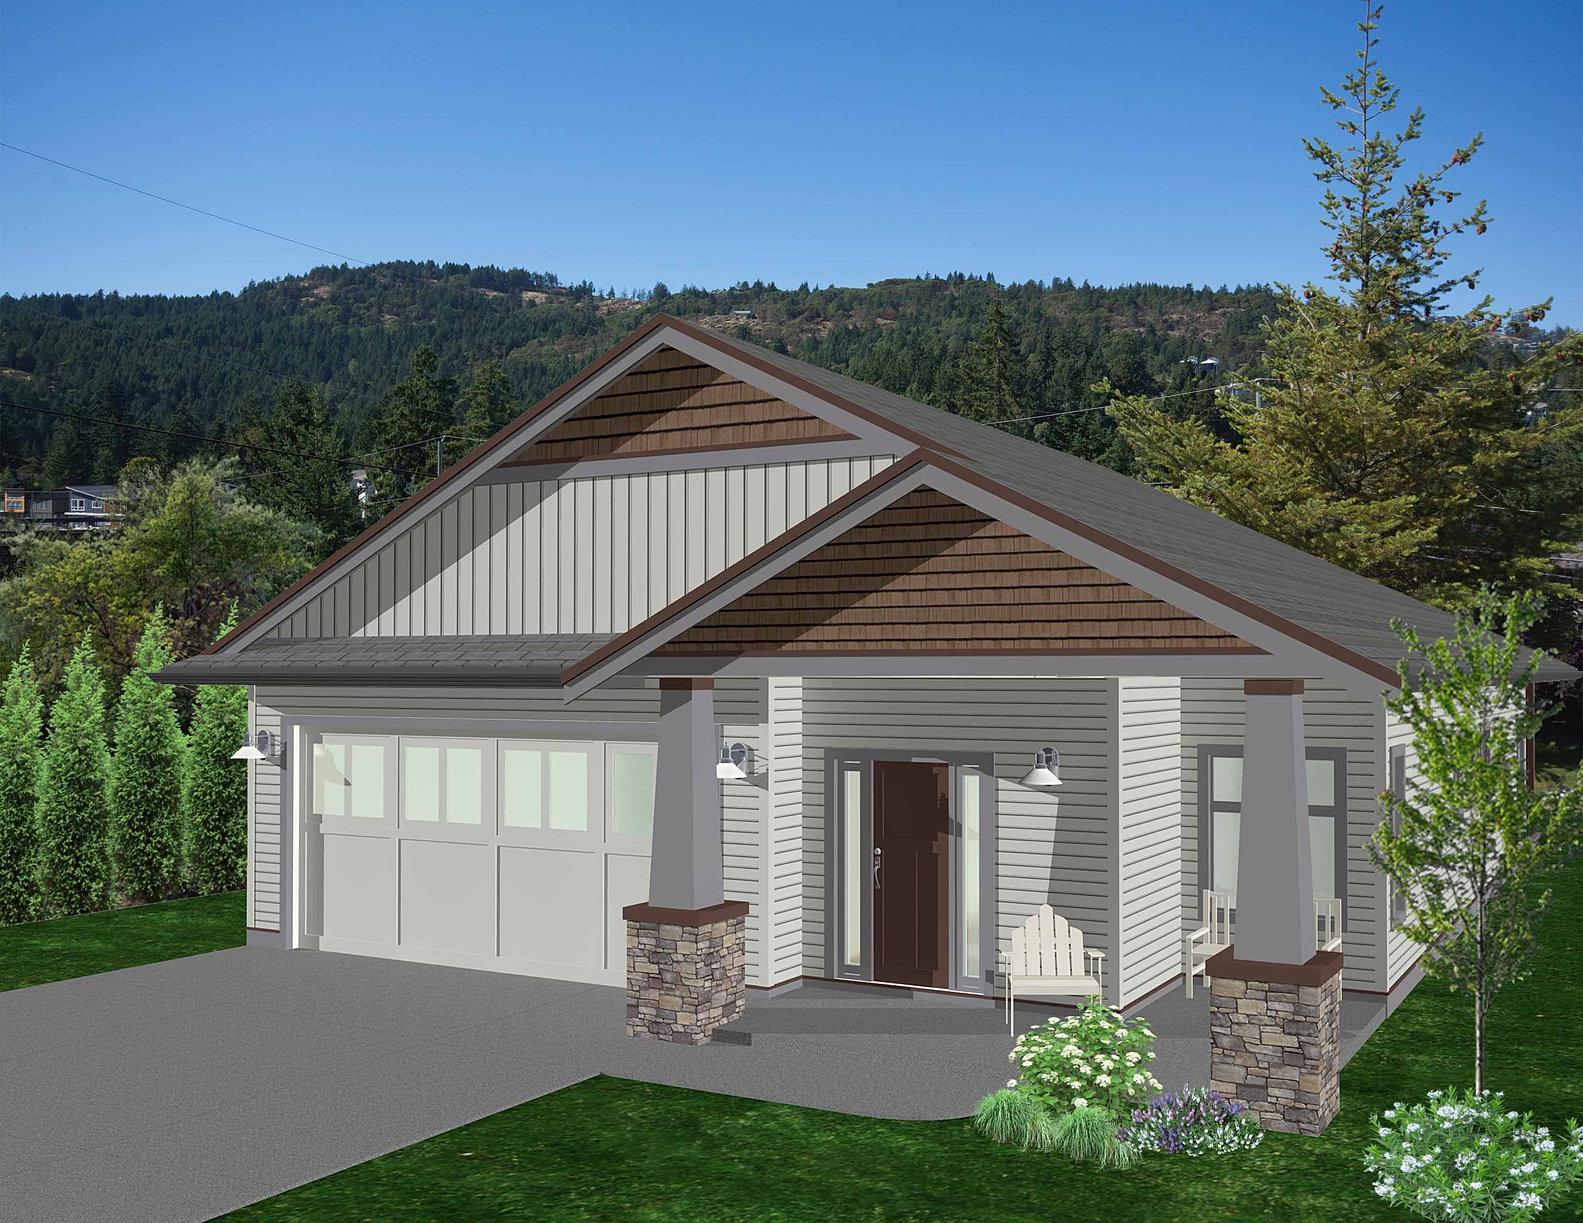 Strange Fleetwood Ranchers Langford Bc Largest Home Design Picture Inspirations Pitcheantrous